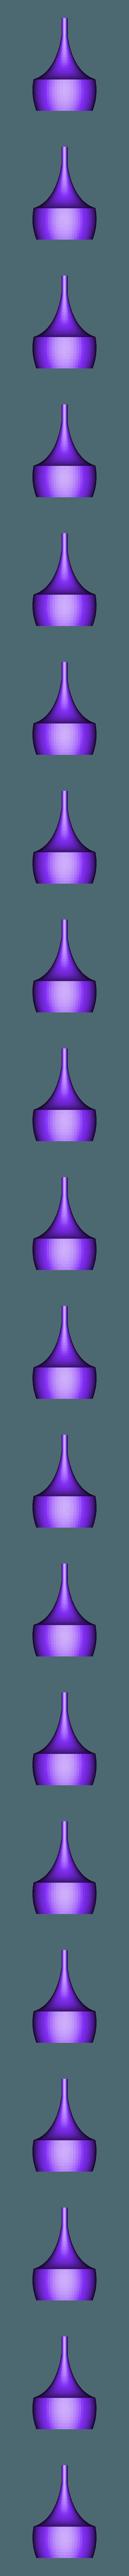 Part3.STL Download free STL file hanging lamps • 3D print design, allv